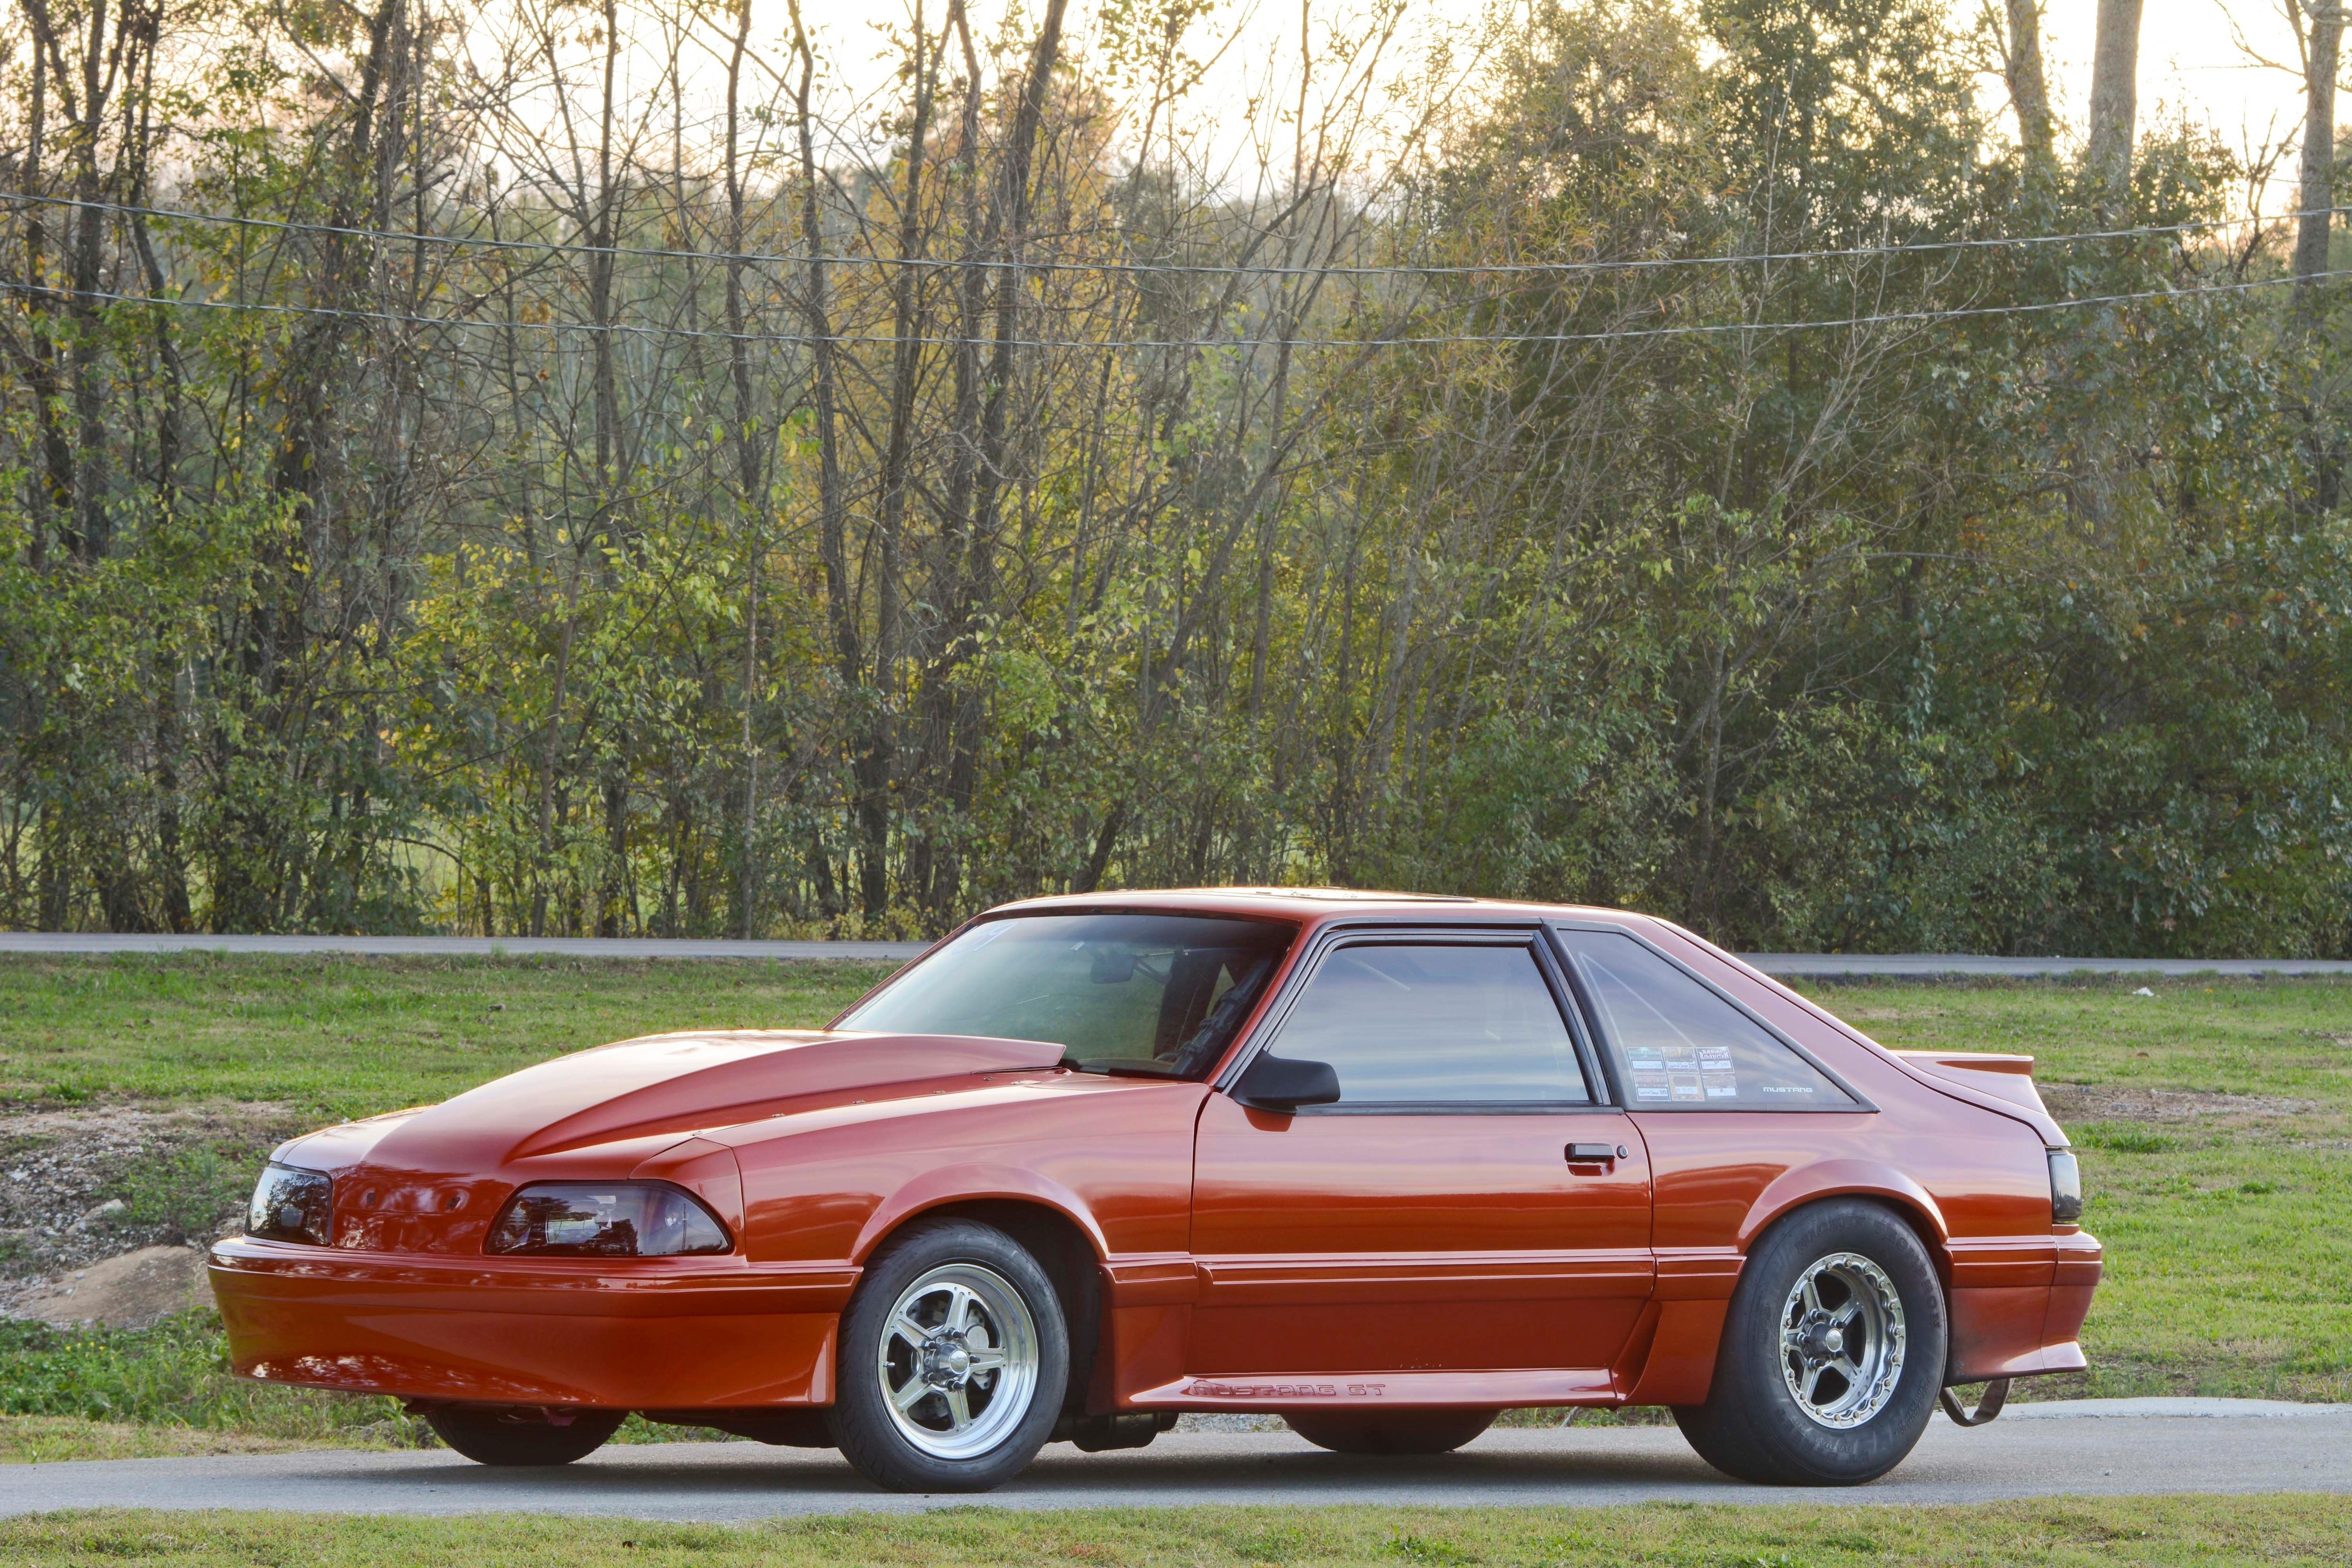 031 Orange Procharged Mustang Overalls